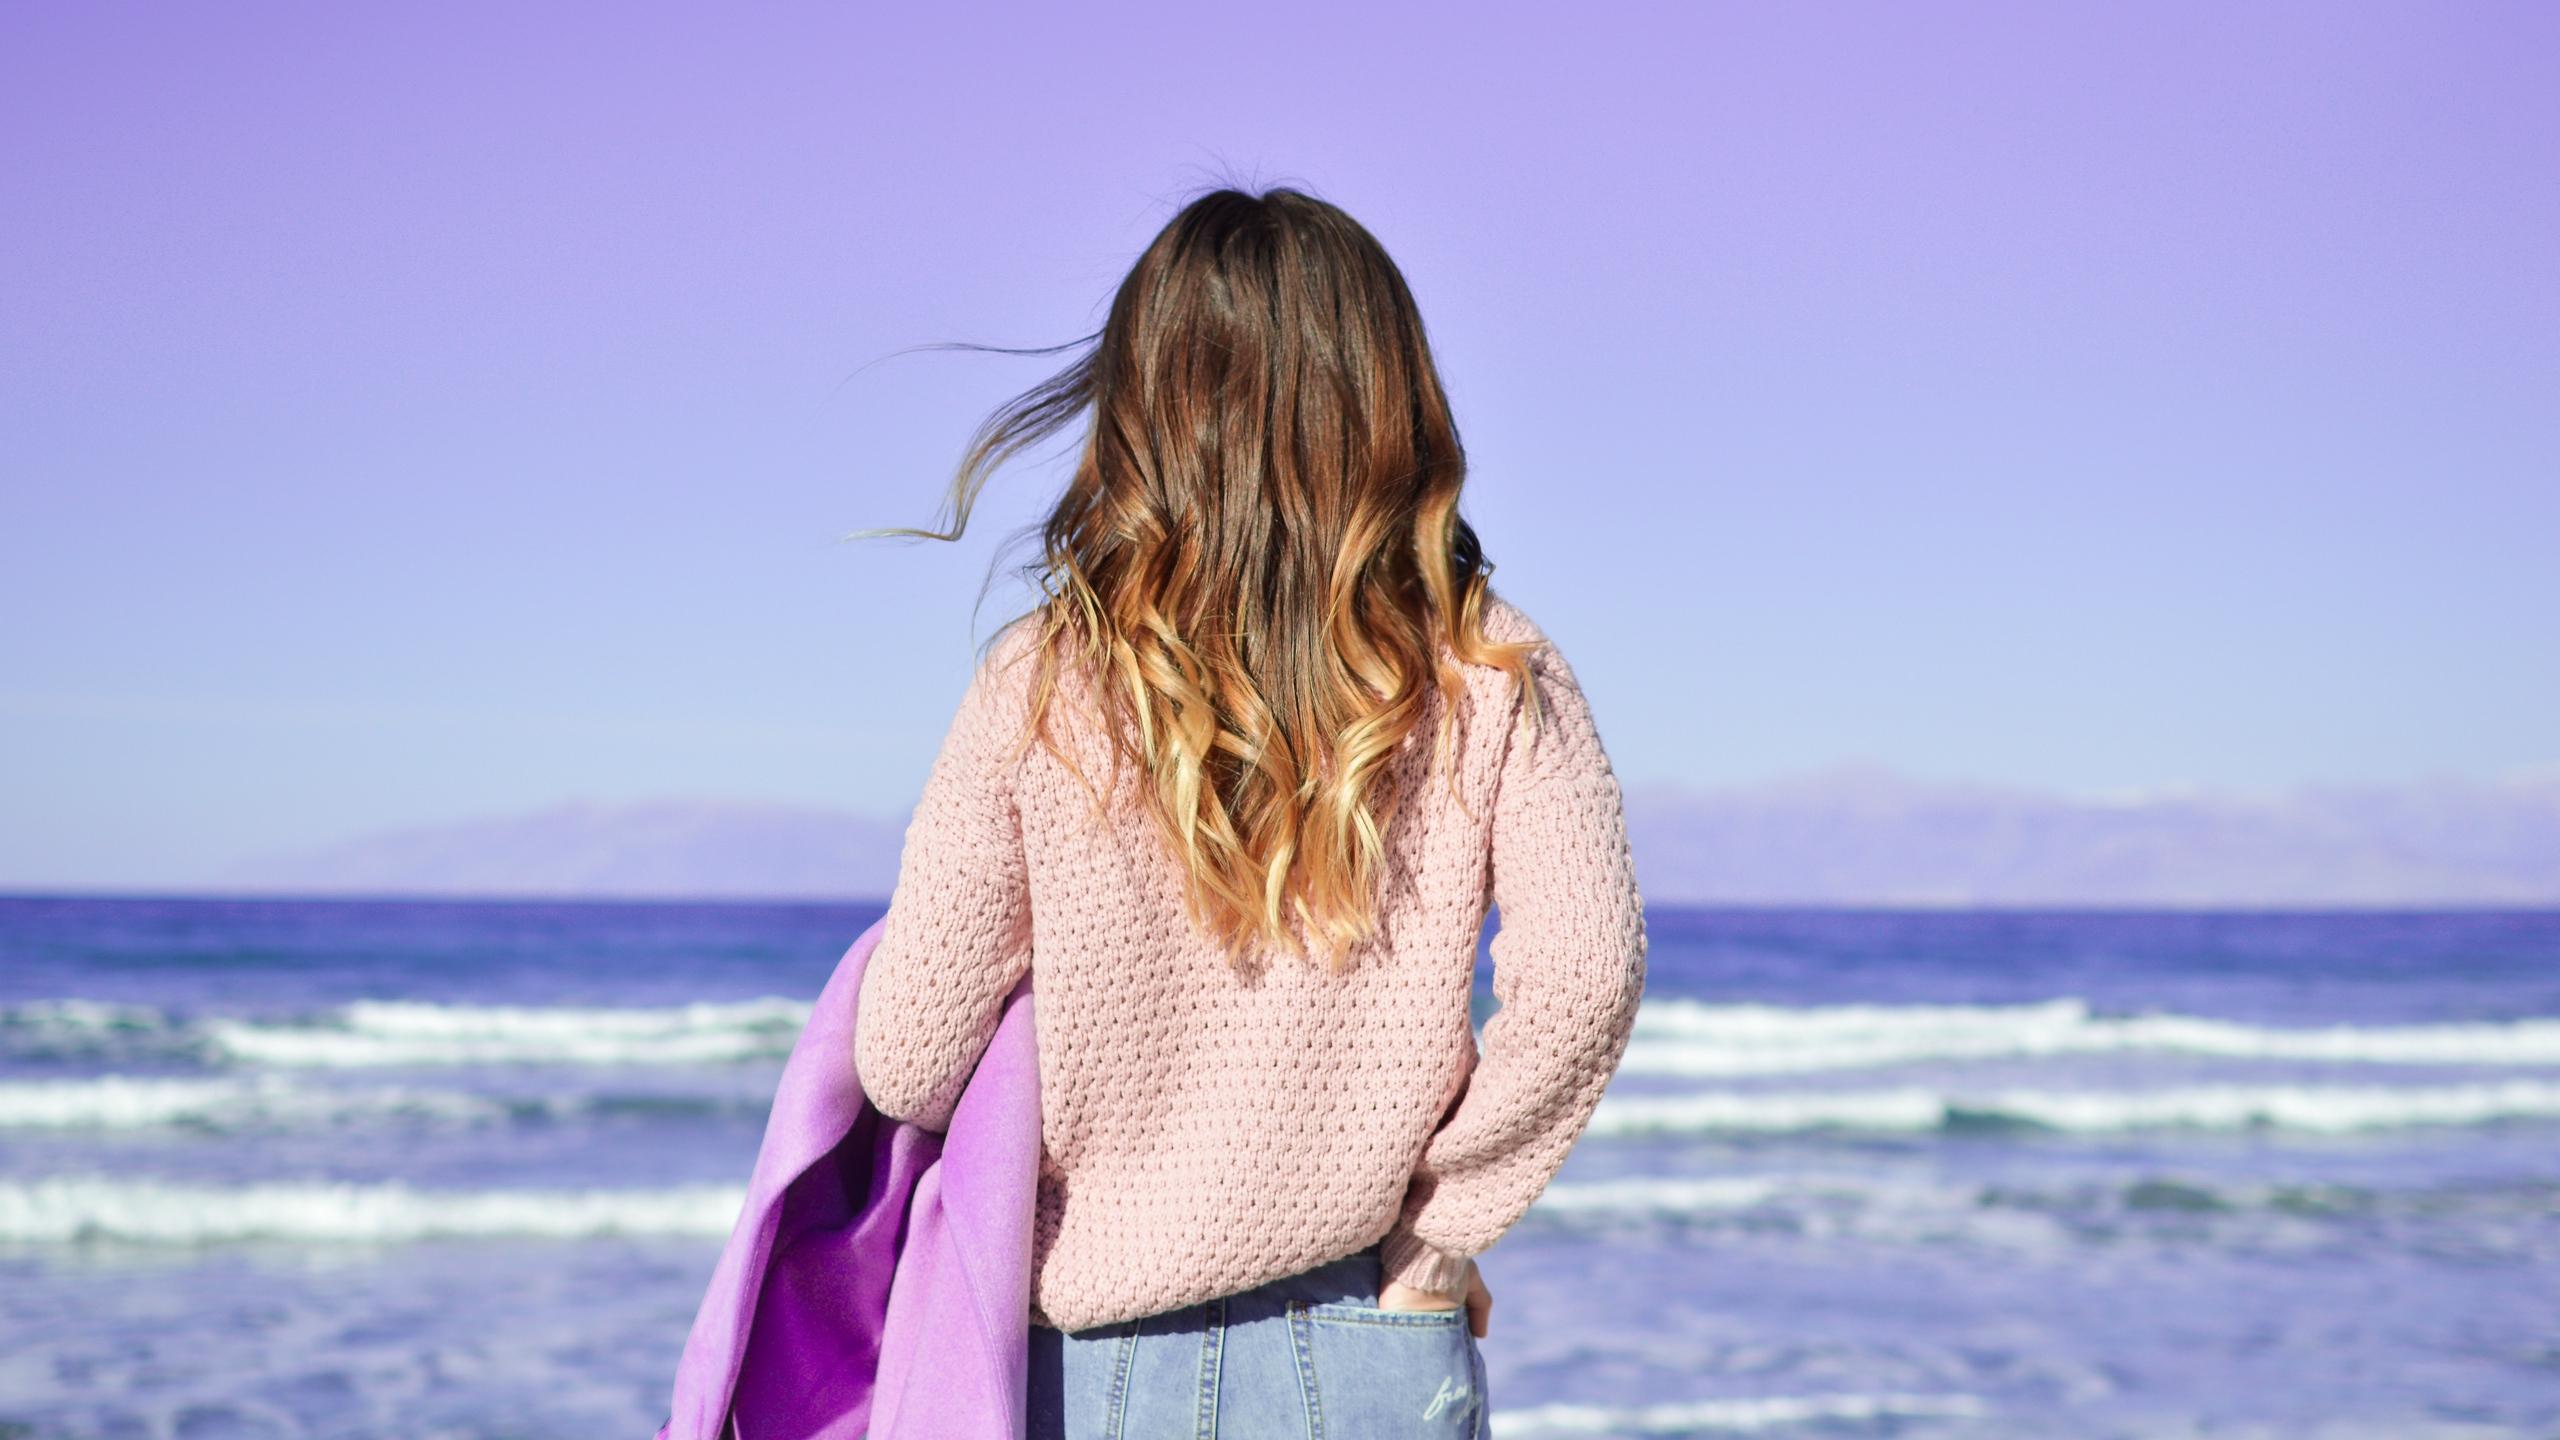 Back Girl Wallpaper - Back Pics Girl Hd , HD Wallpaper & Backgrounds